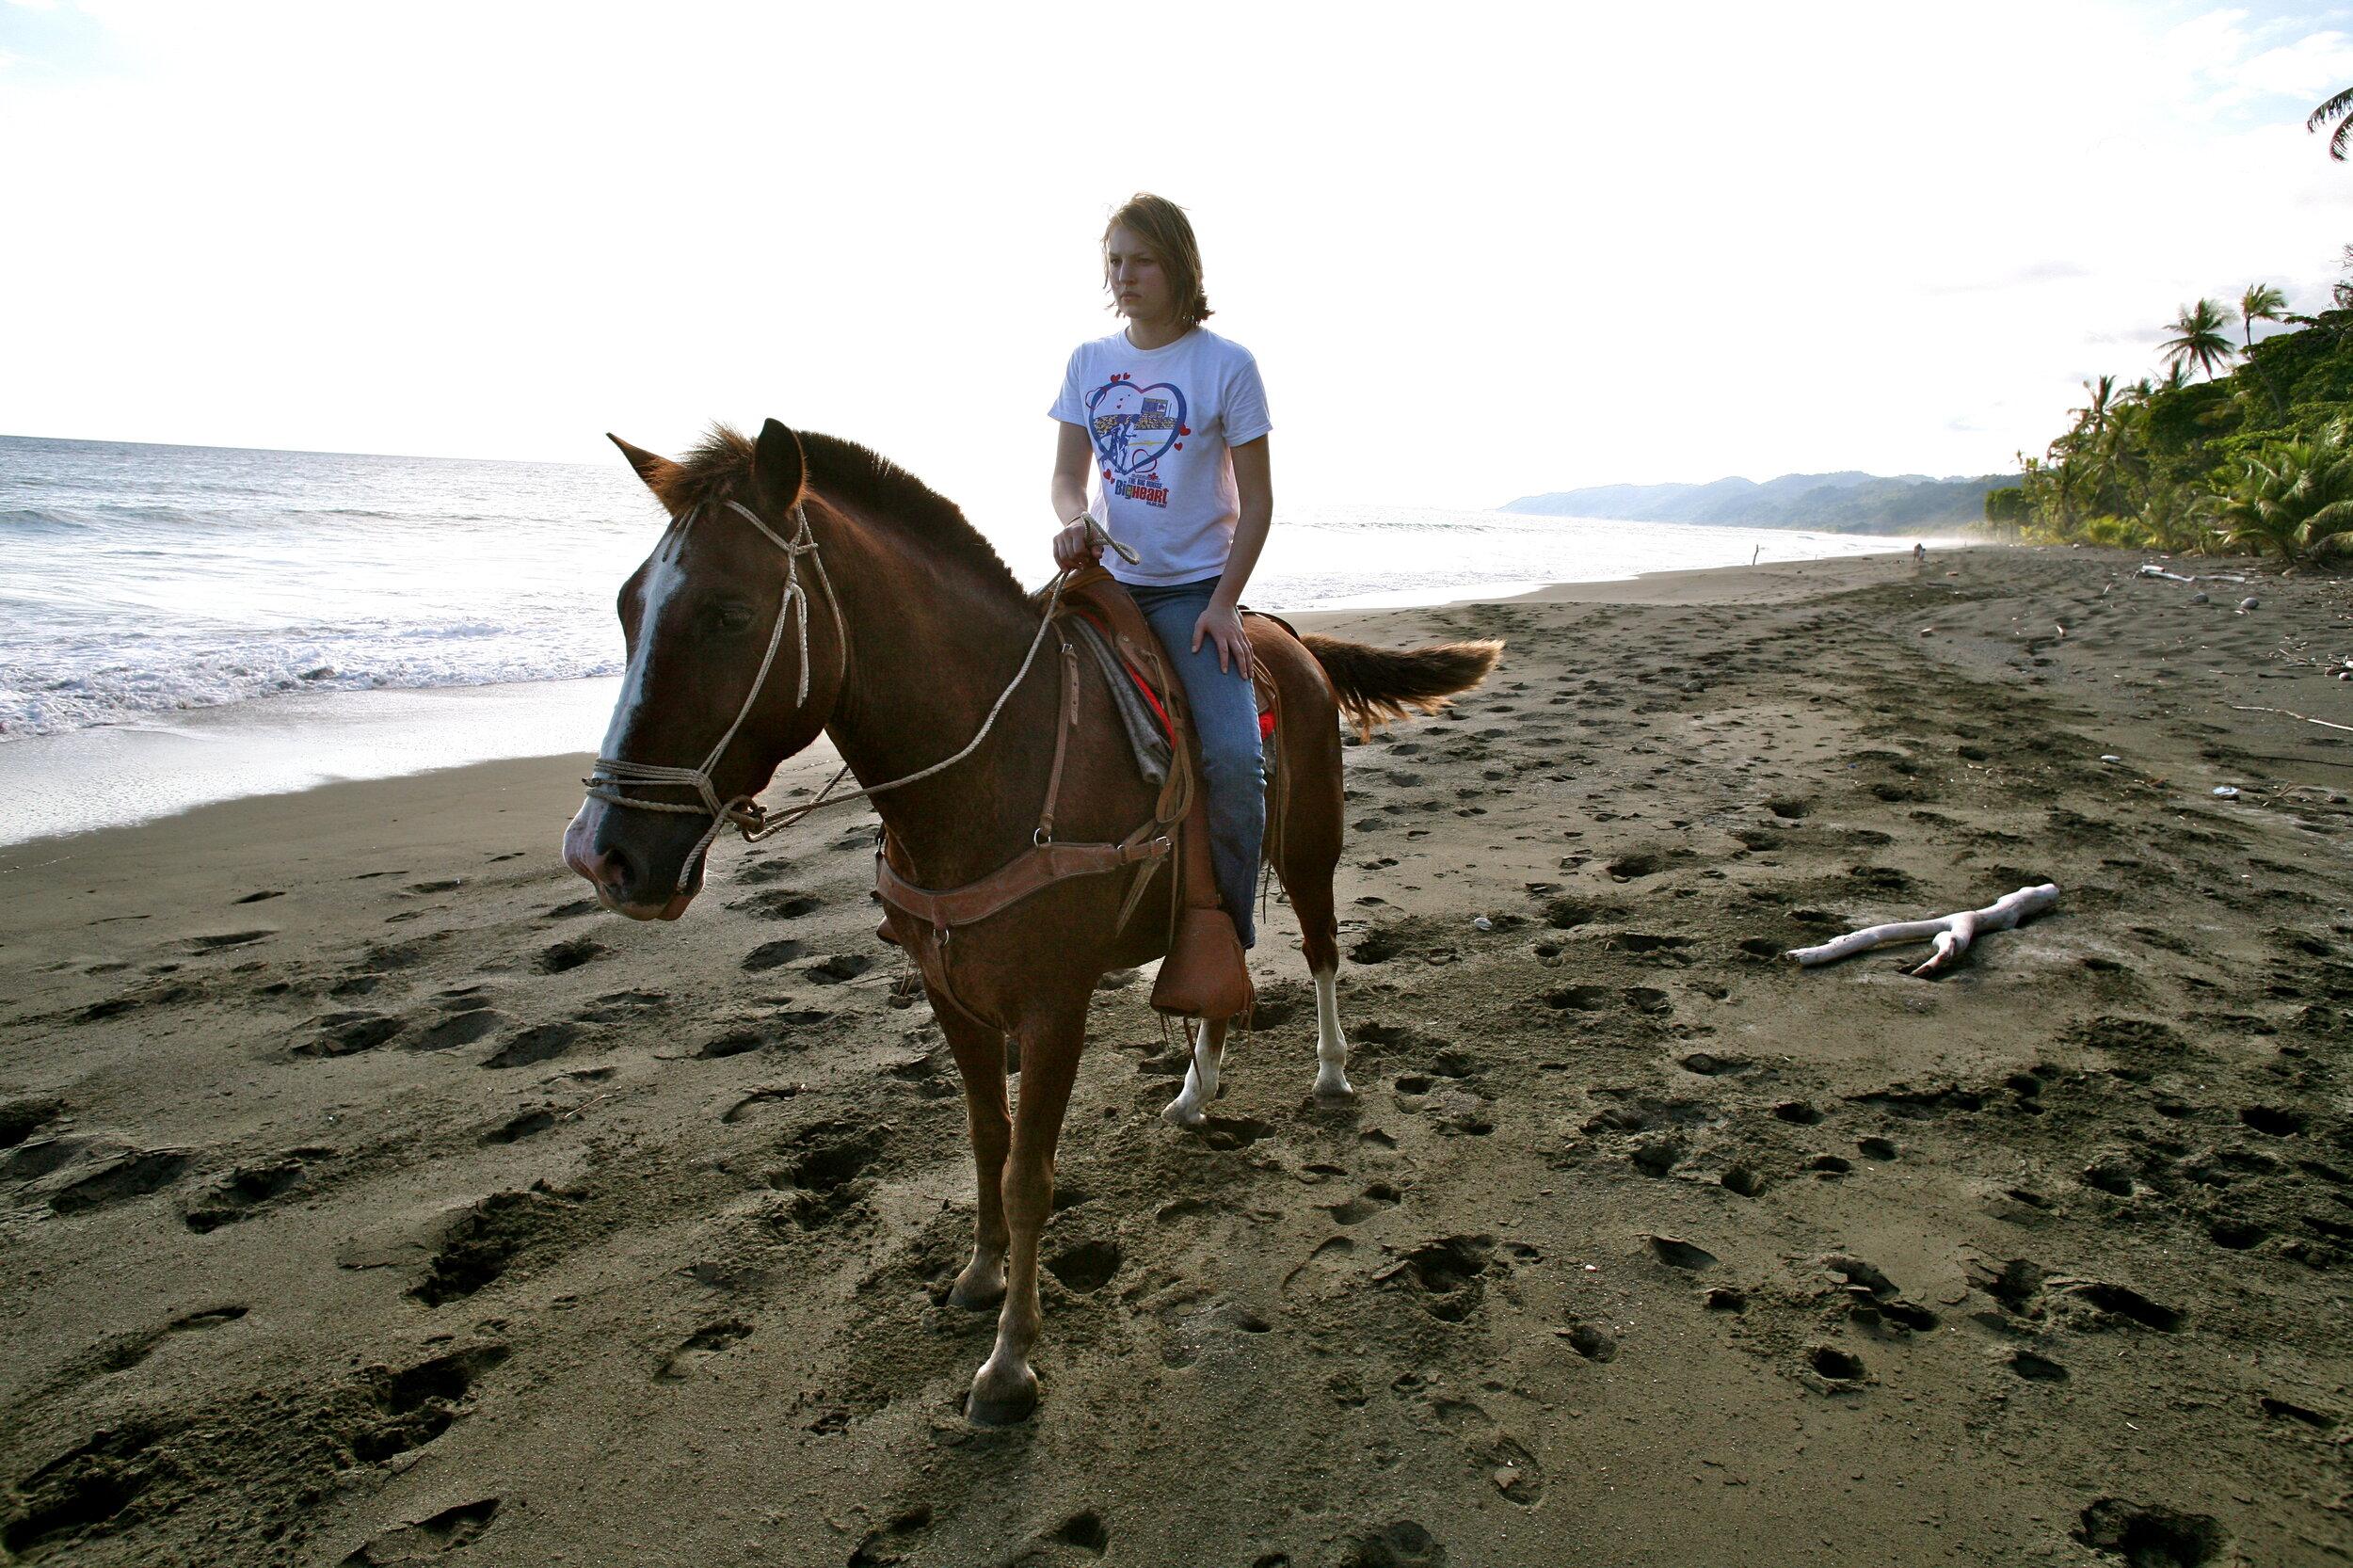 Horseback - Ride horses on a remote tropical beach…